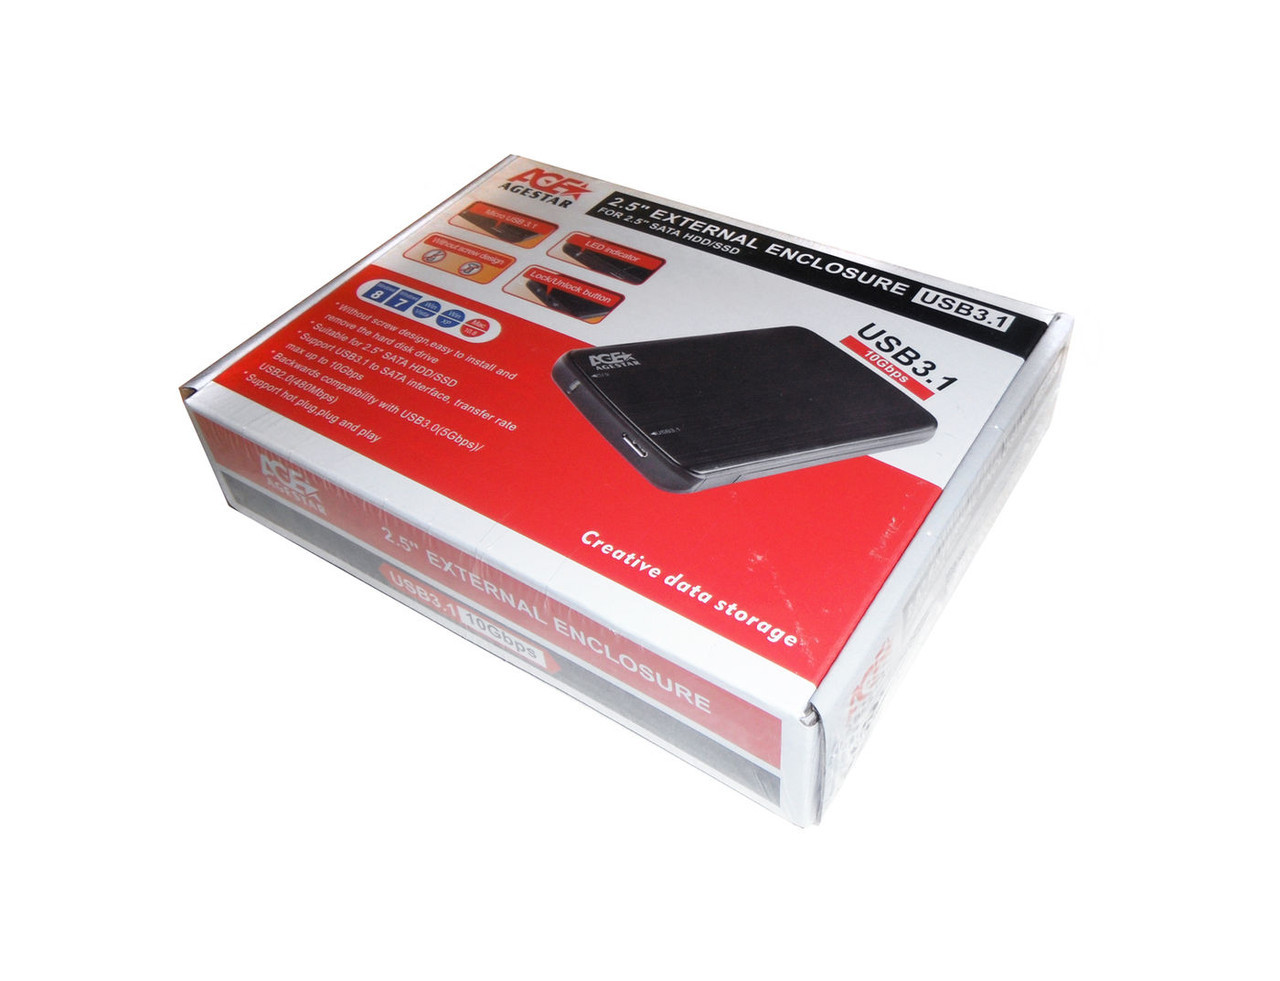 Карман внешний 2,5' Agestar 31UB2A12 Black SATA USB3.1 - Sale365 в Николаеве